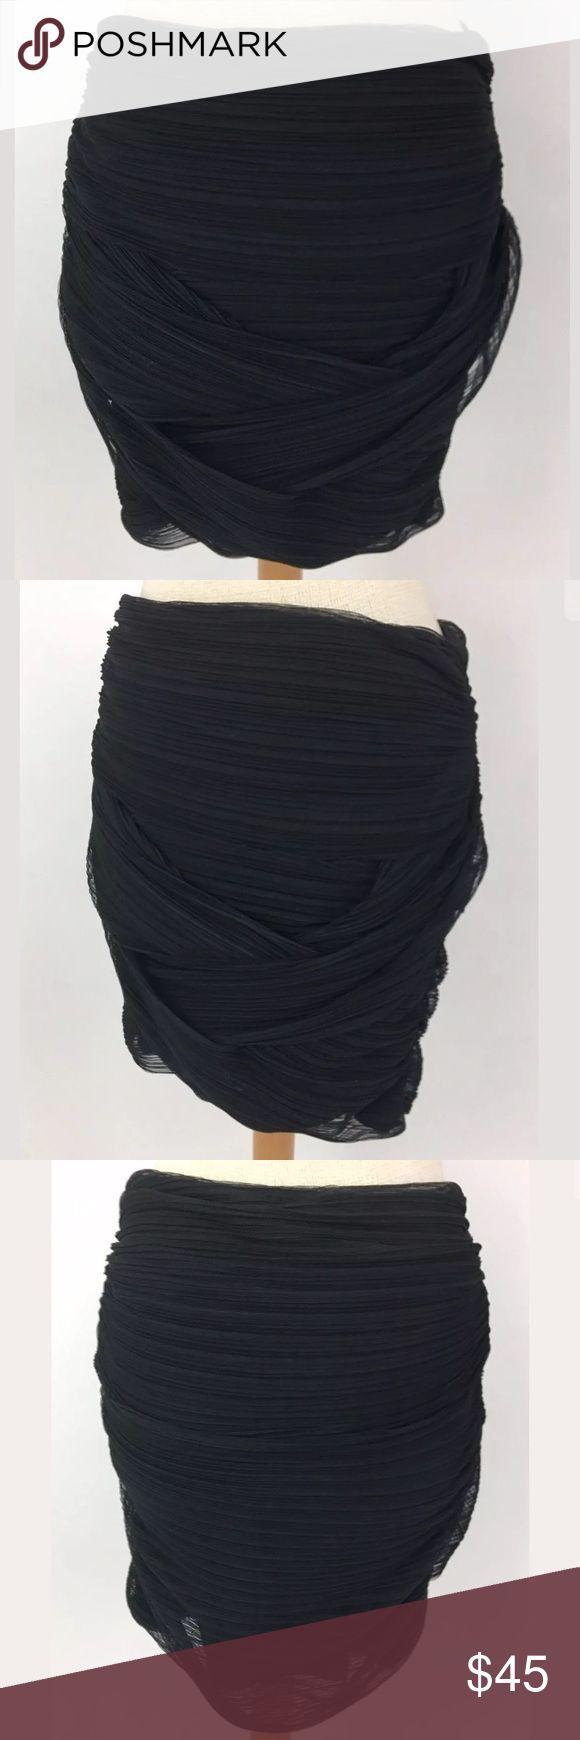 BCBG Max Azria mini skirt Waist: 32 Length: 19 100% polyester, lined in 84% polyester, 16% Spandex   Item: 2060 BCBGMaxAzria Skirts Mini